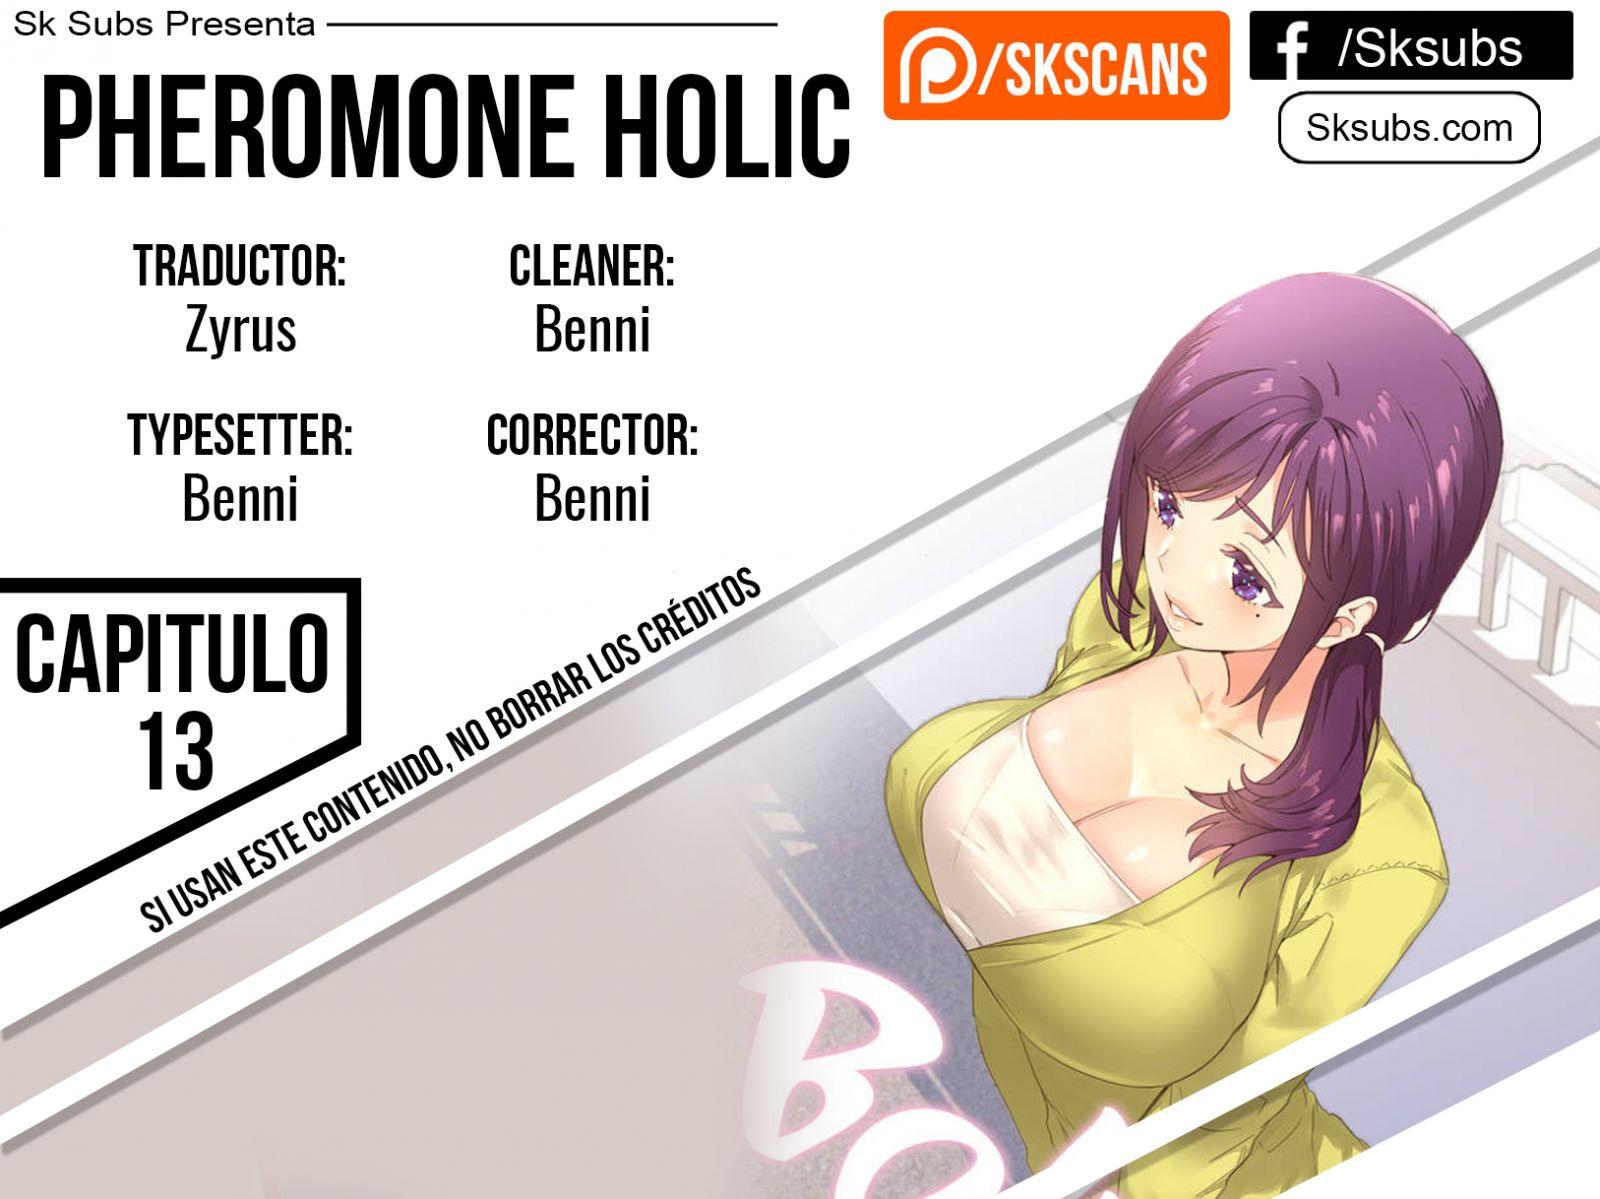 https://c9.mangatag.com/es_manga/pic5/58/25146/644430/6390078966faadd1a63951ccbff7d60b.jpg Page 1